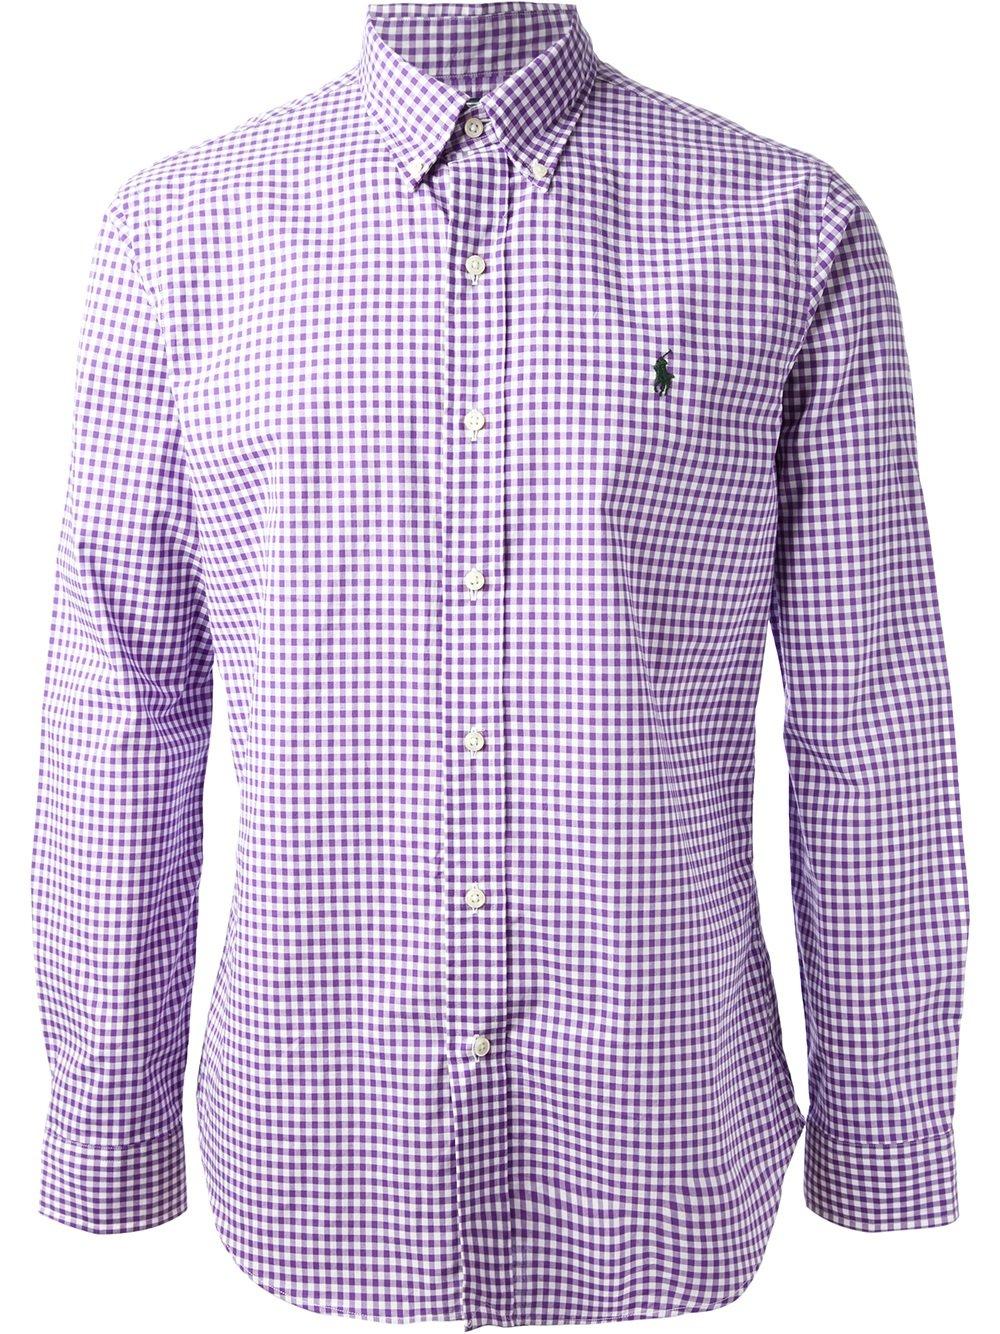 42d6da39046c Lyst - Polo Ralph Lauren Checked Shirt in Purple for Men